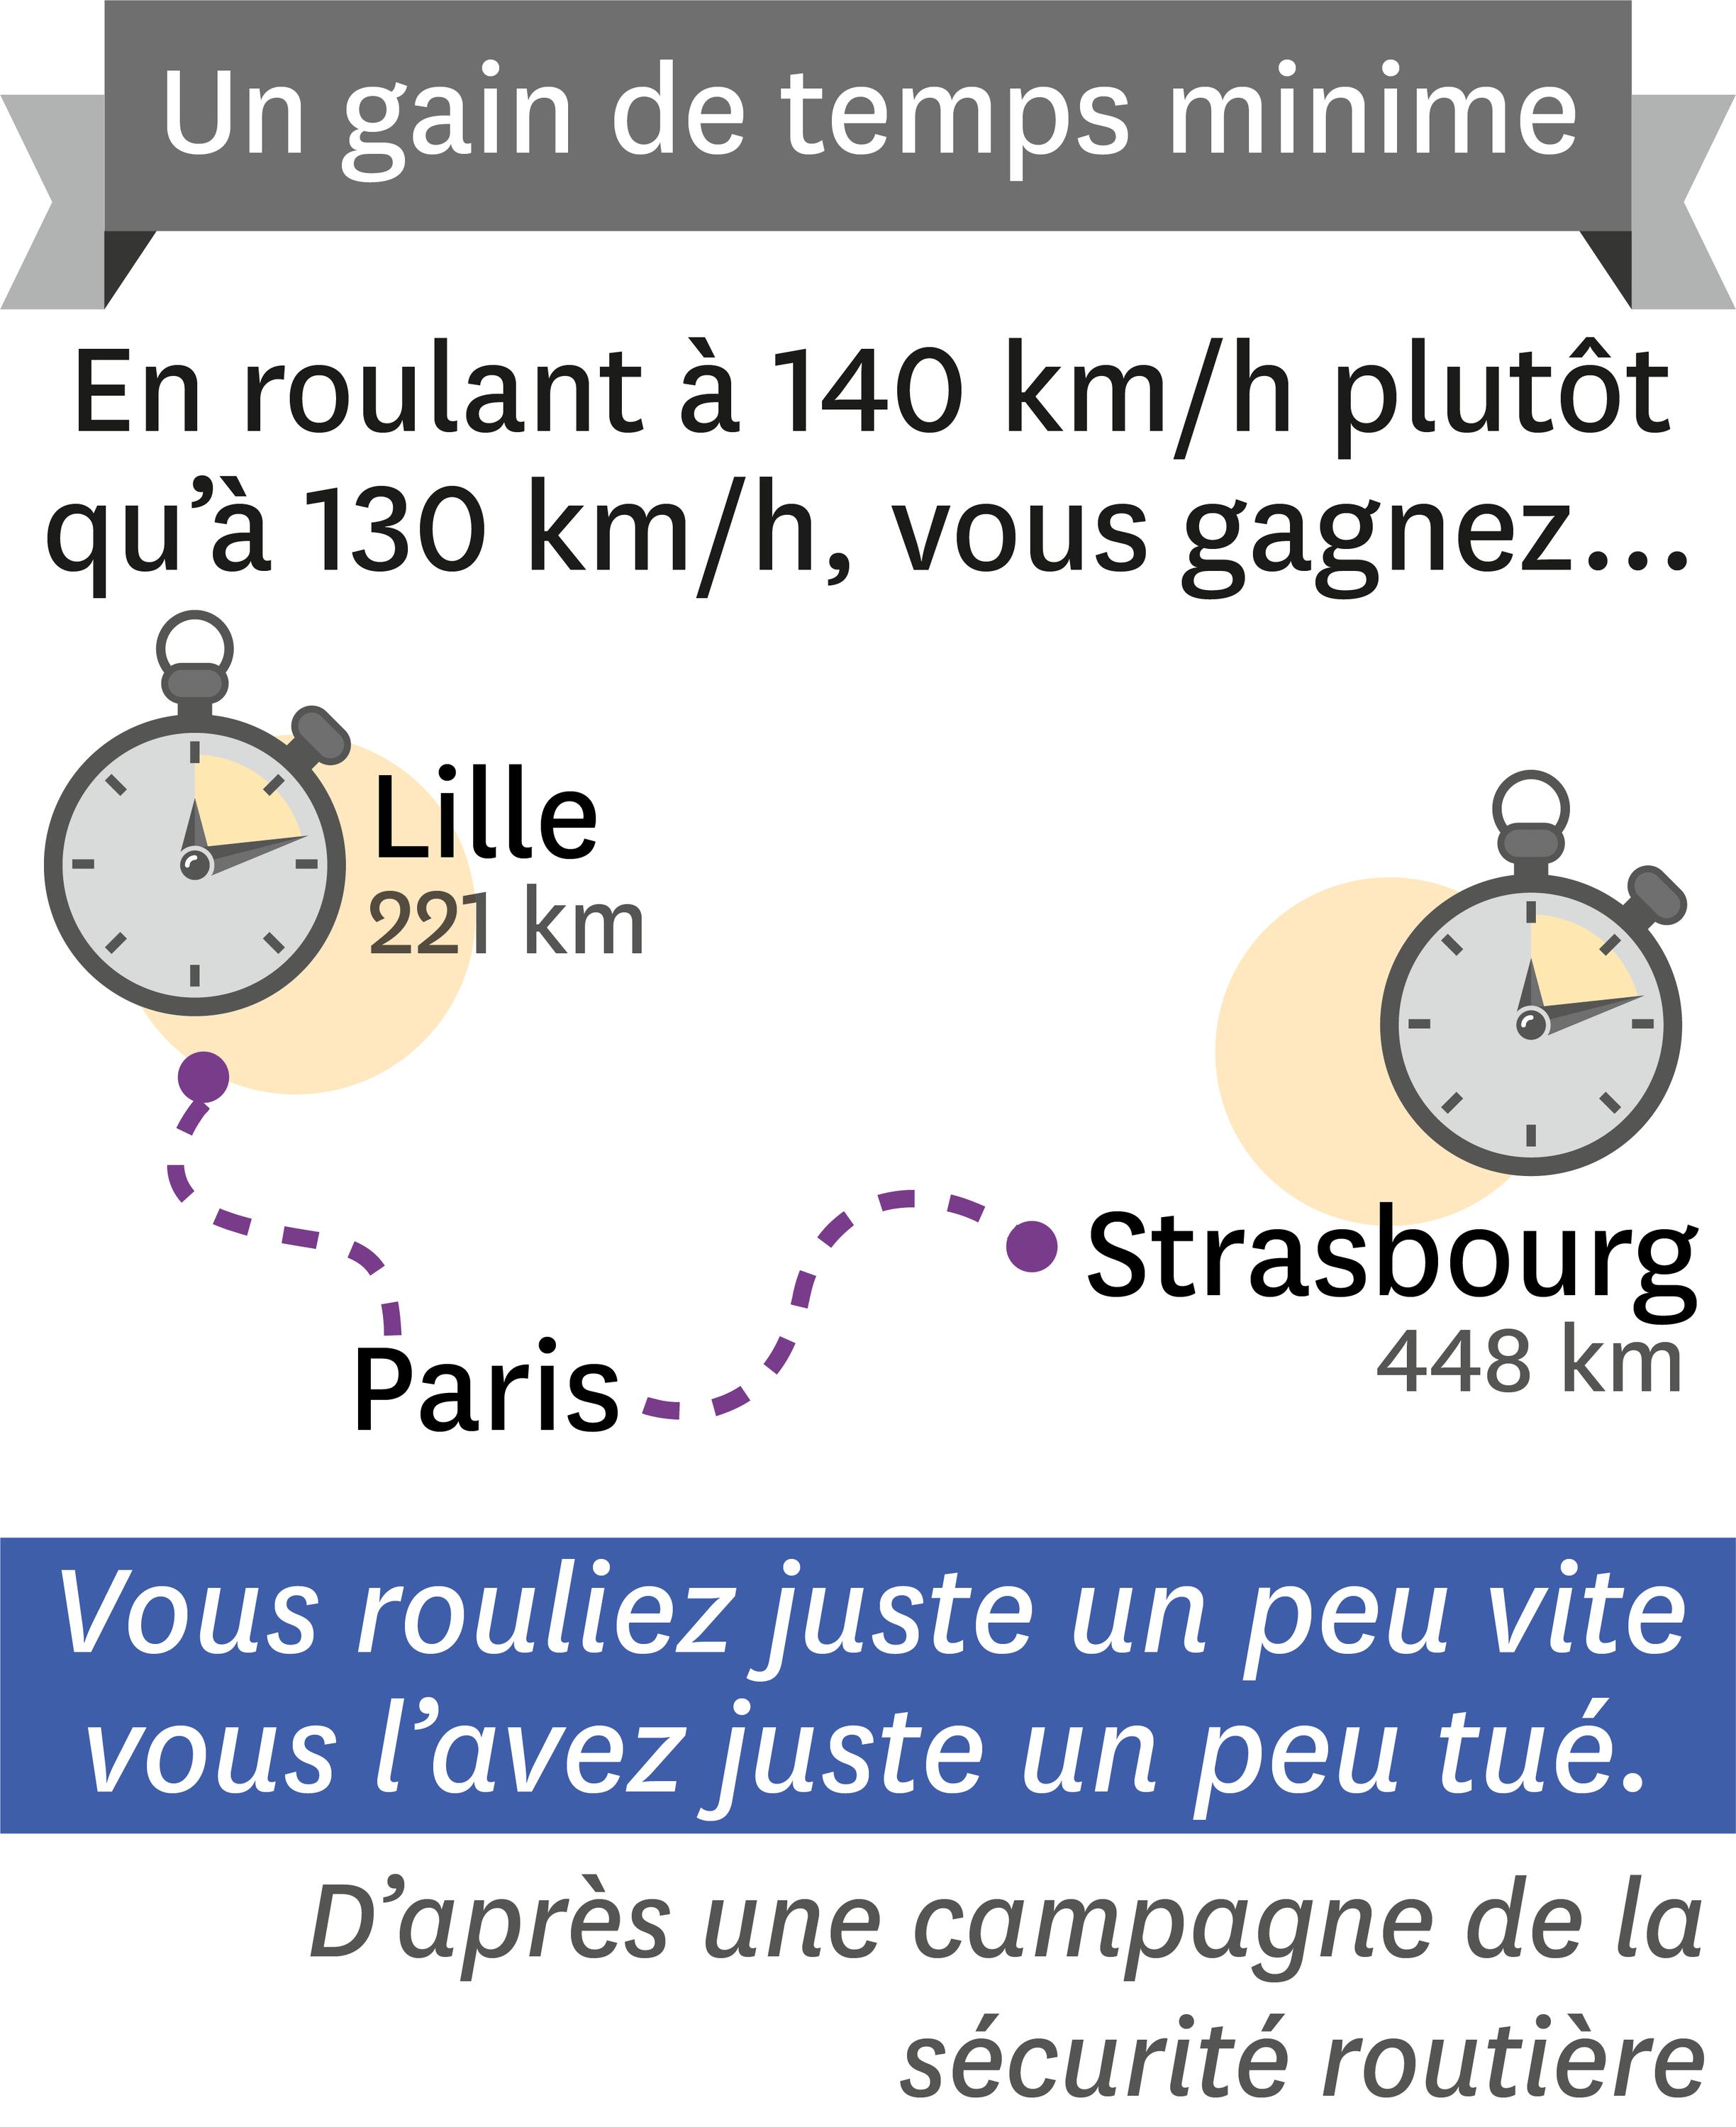 Lille - Paris - Strasbourg.